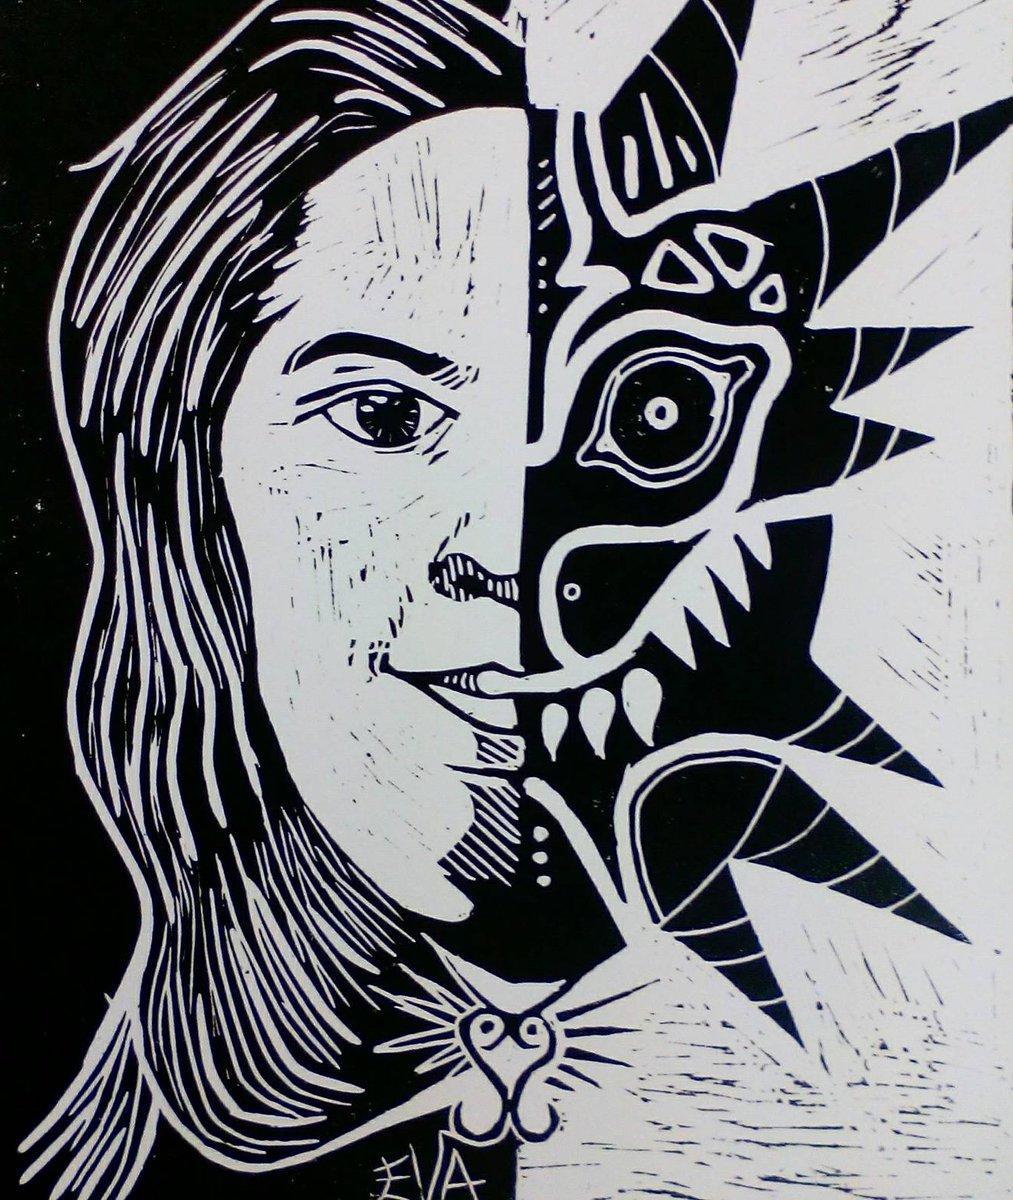 #linoleum #linoleo #grabado #selfportrait #autorretrato #praga #praha #prague #lovepraga #erasmus #erasmusplus #work<br>http://pic.twitter.com/uVlXVgoROE